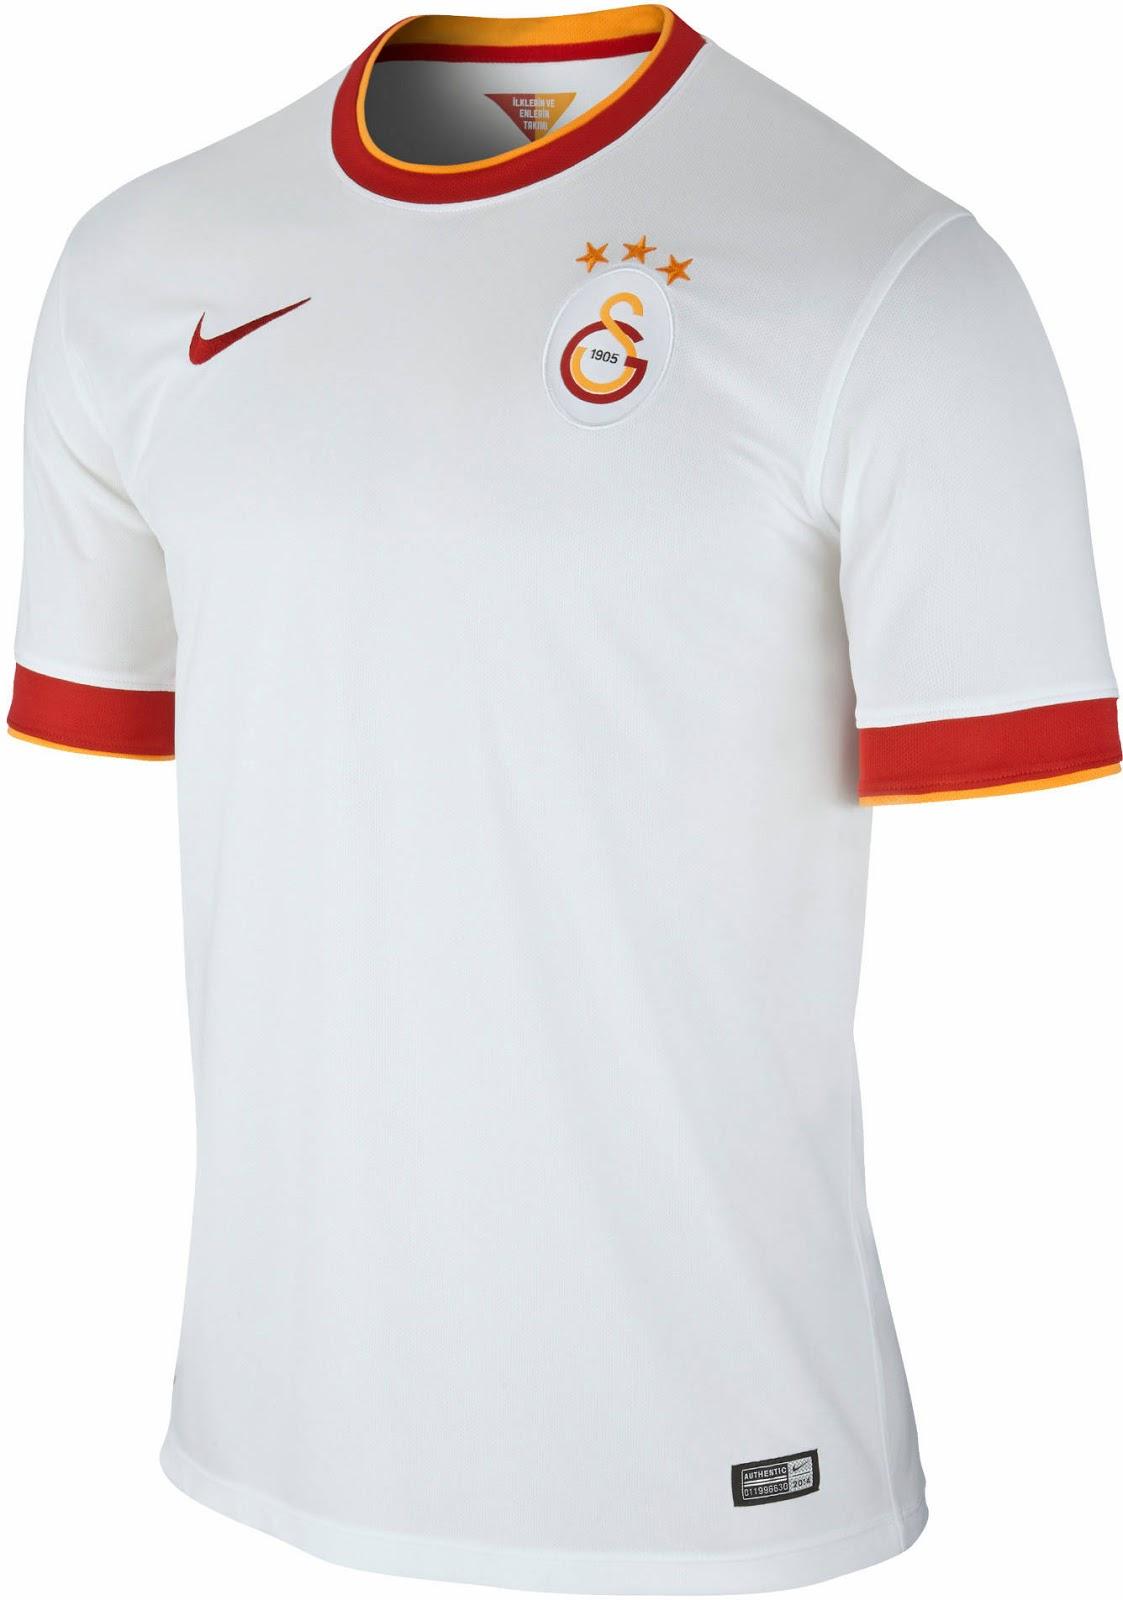 http://2.bp.blogspot.com/-mif3aqLw9Us/U8jcyd7nQxI/AAAAAAAAUYk/kzn9B3iqVwU/s1600/Galatasaray-14-15-Away-Kit+(1).jpg